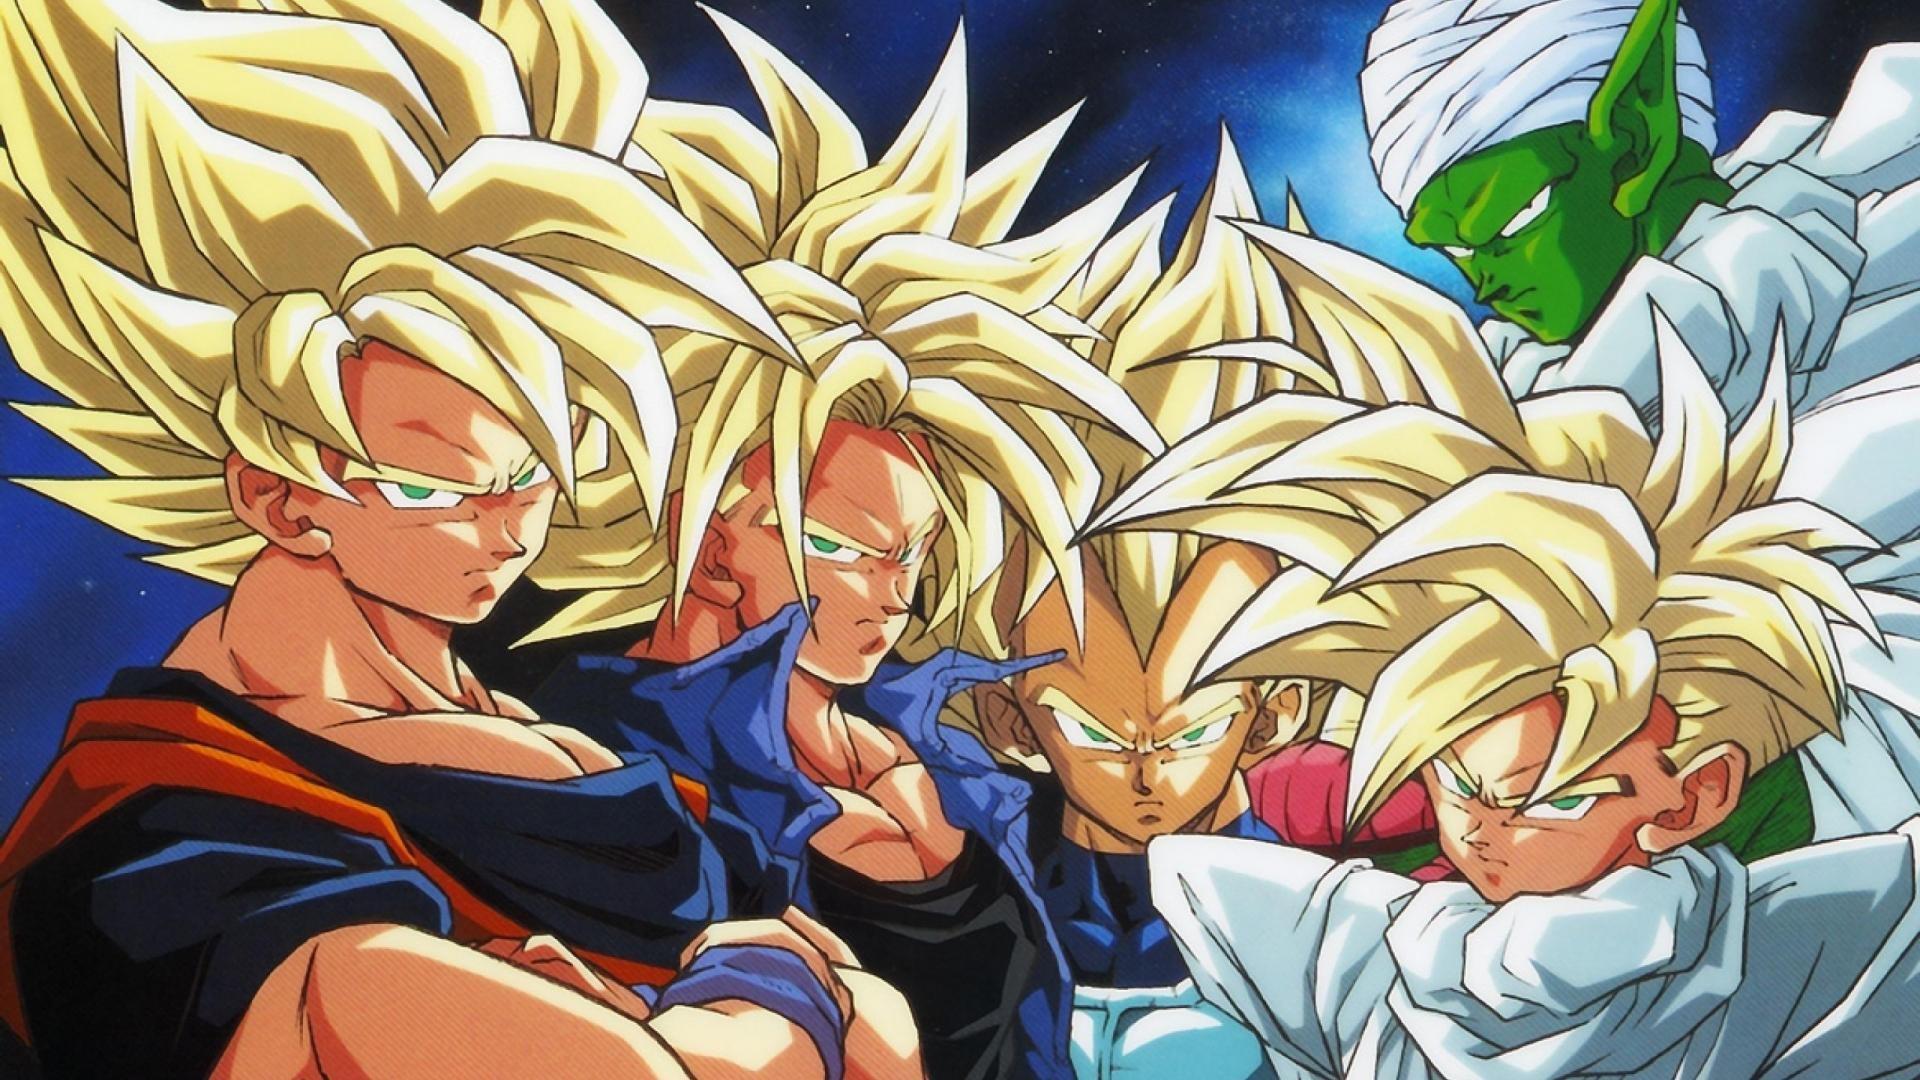 Dragon Ball Z Trunks Wallpaper